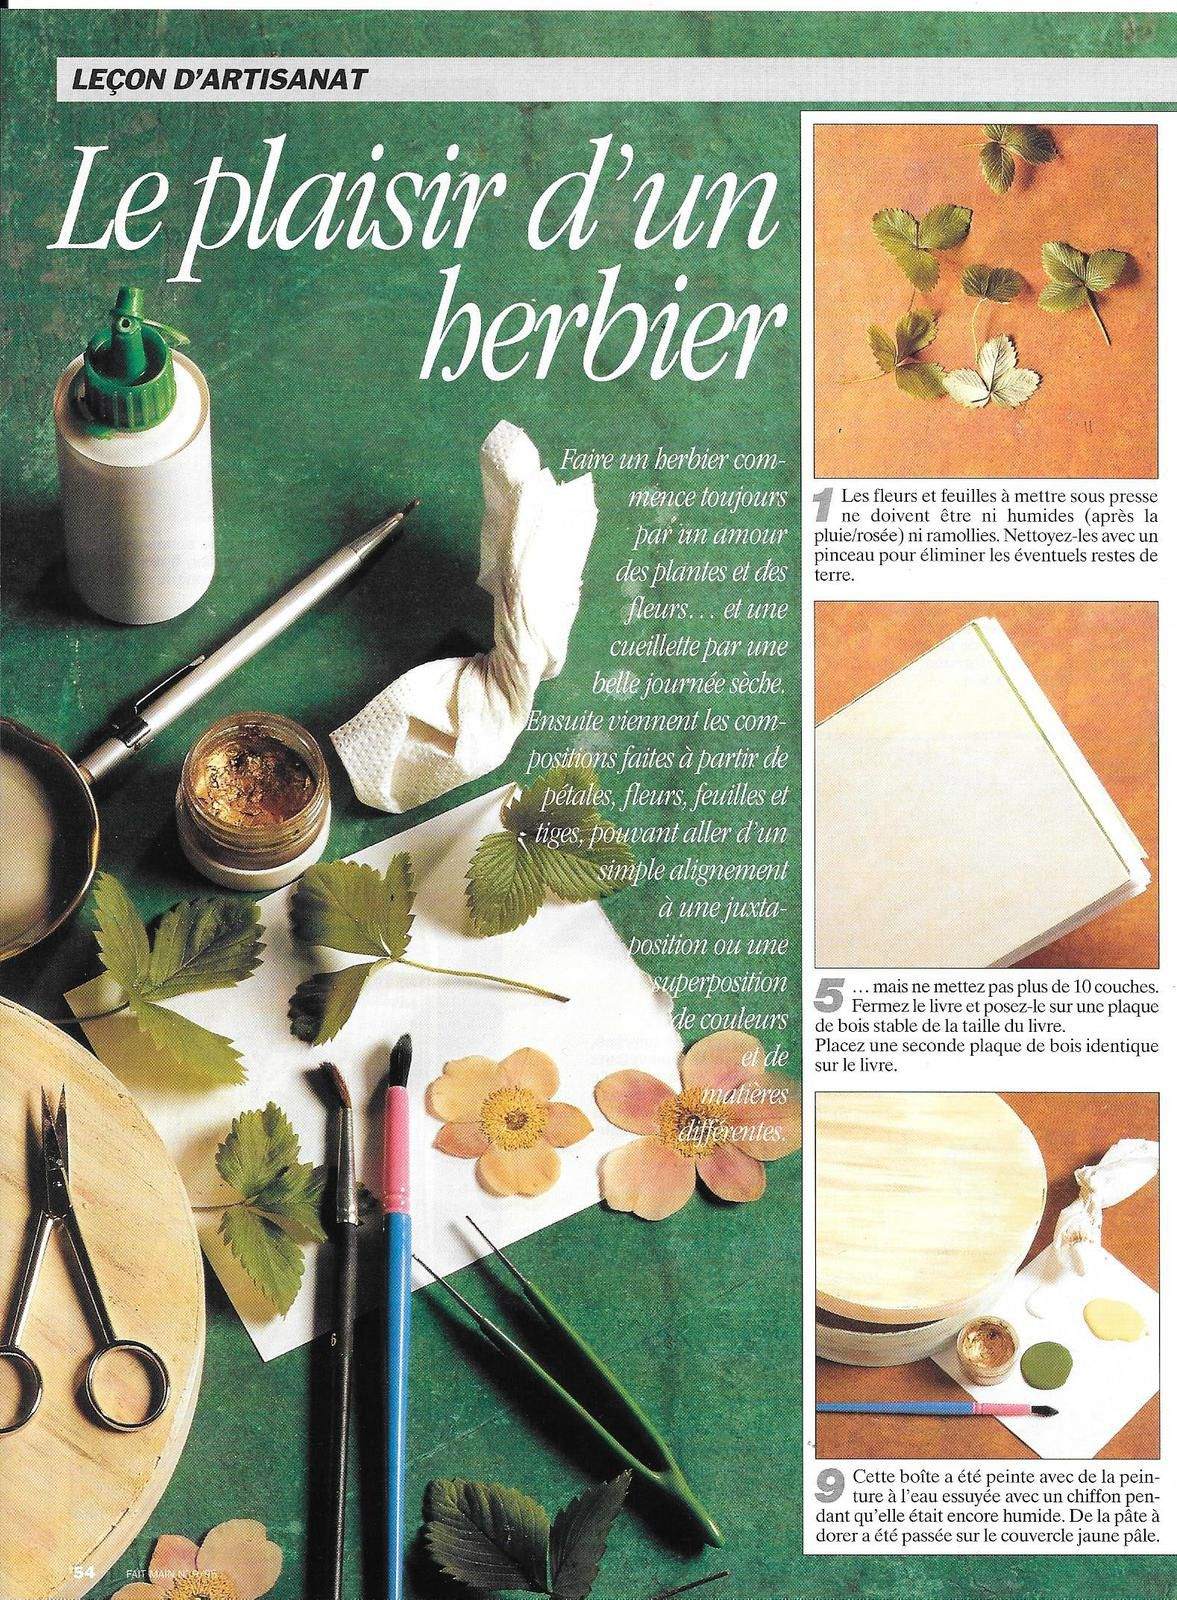 Herbier et une utilisation originale